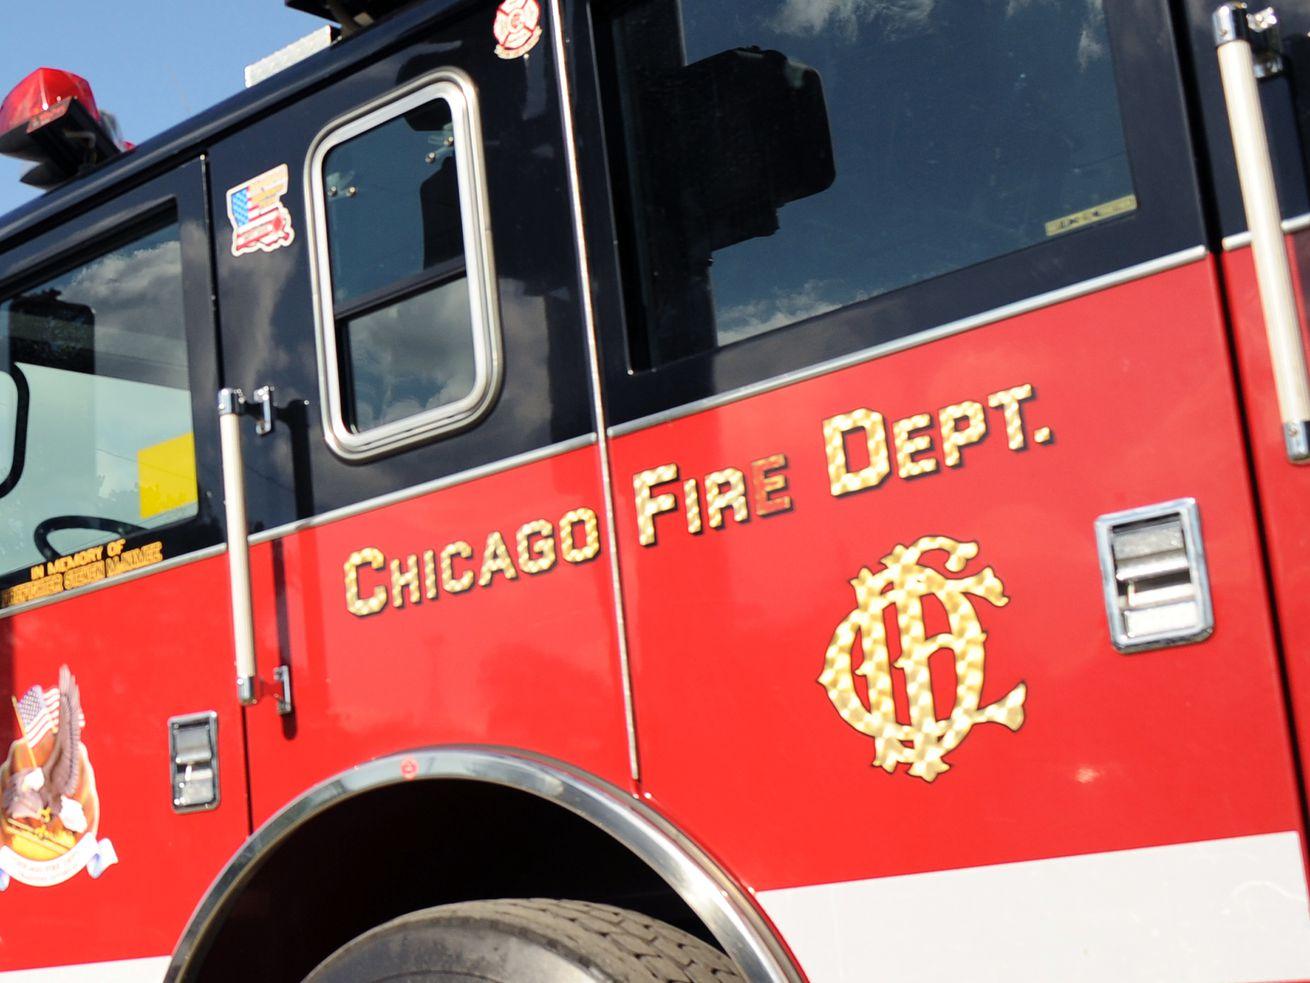 A Chicago Fire Department truck.